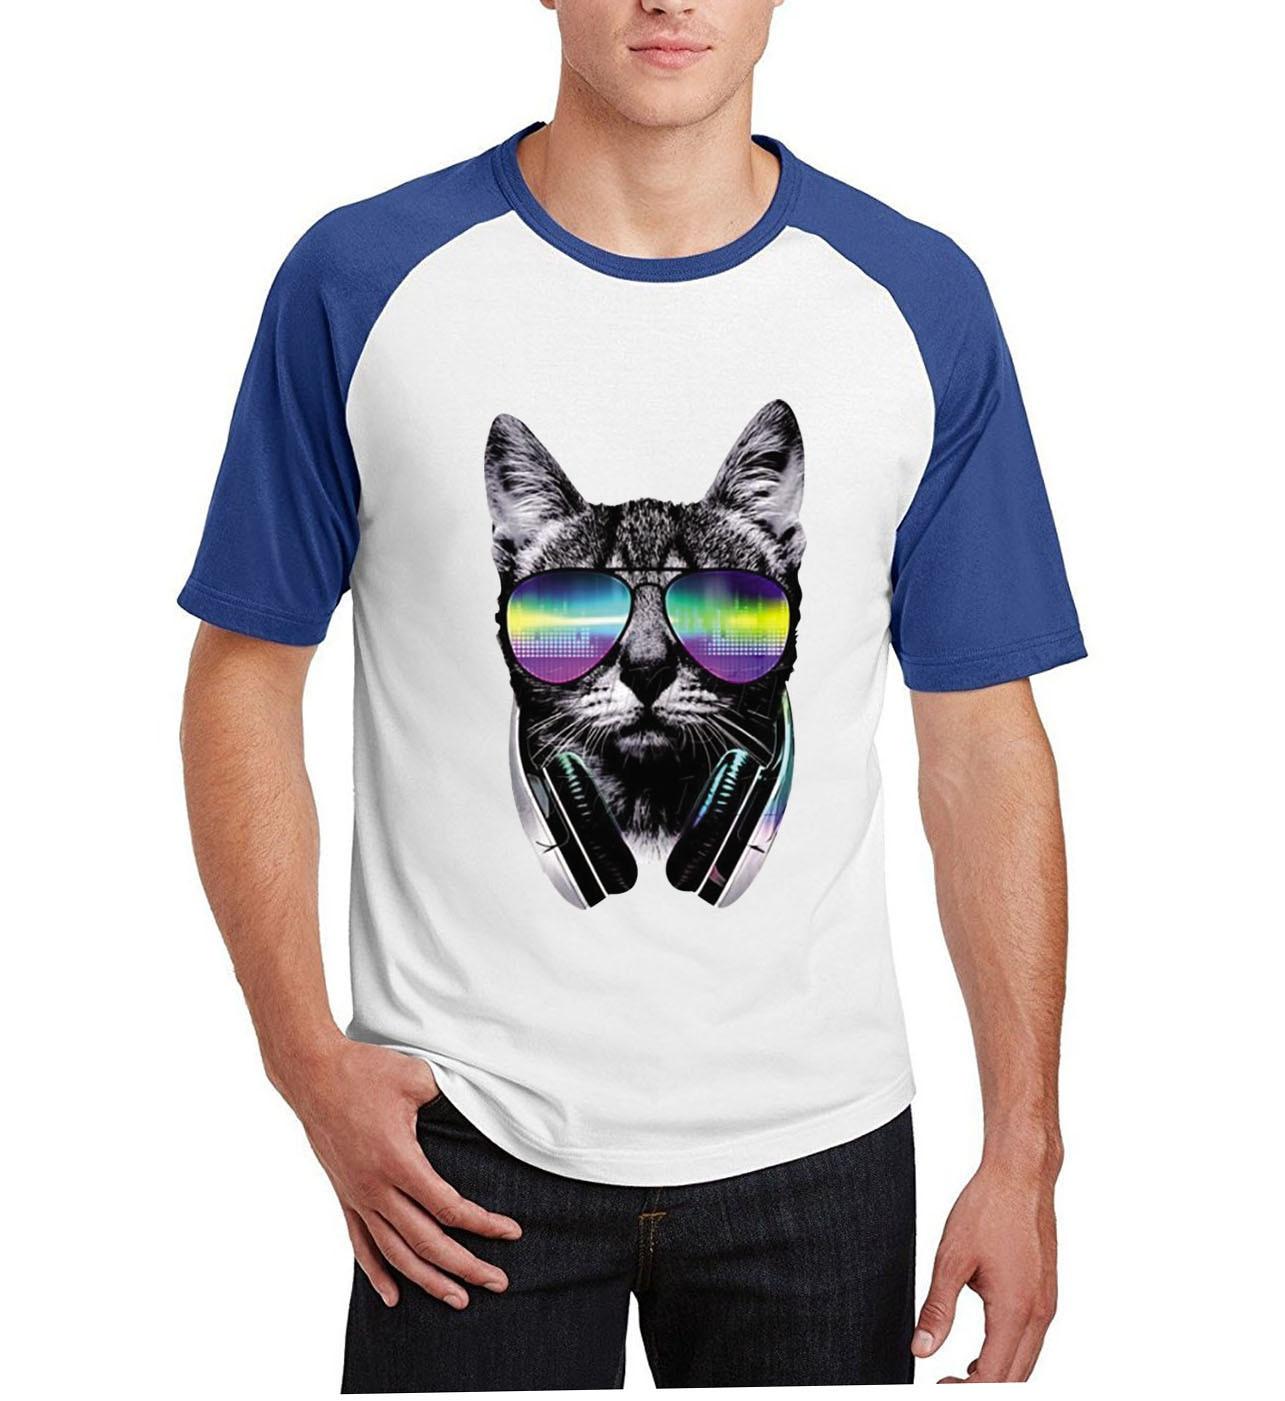 o-neck cotton camisetas cotton kpop tops tee novelty music DJ cat printing t shirts men short raglan sleeve t-shirts 2019 summer